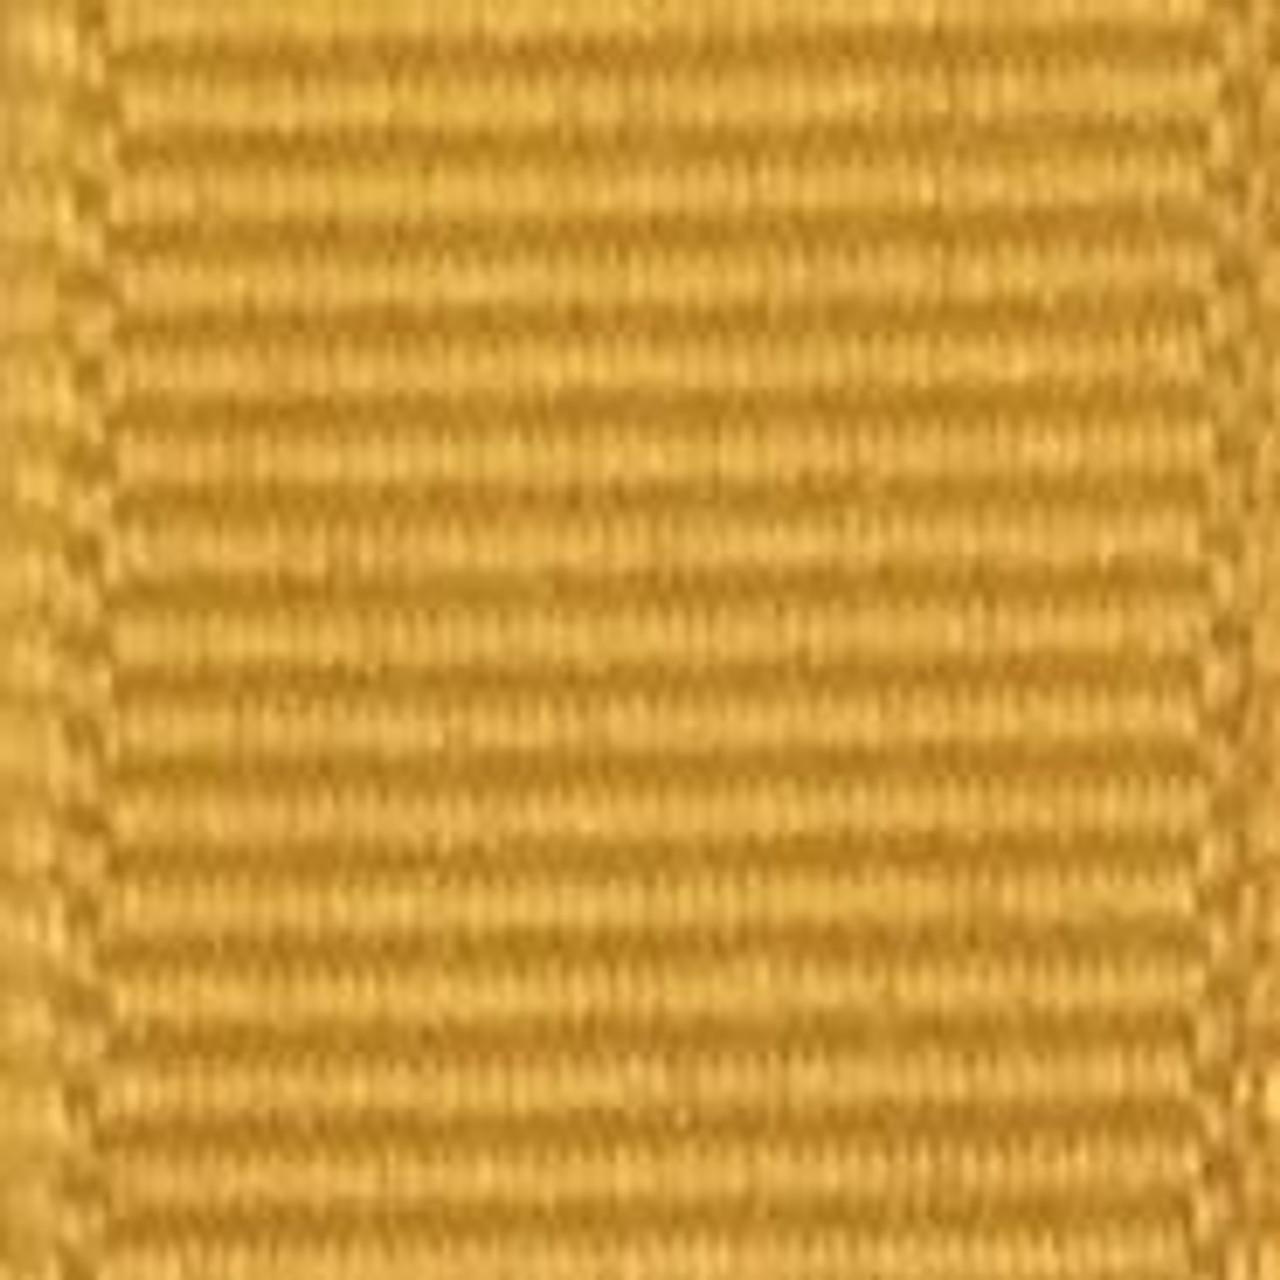 Gold Solid Grosgrain Ribbon